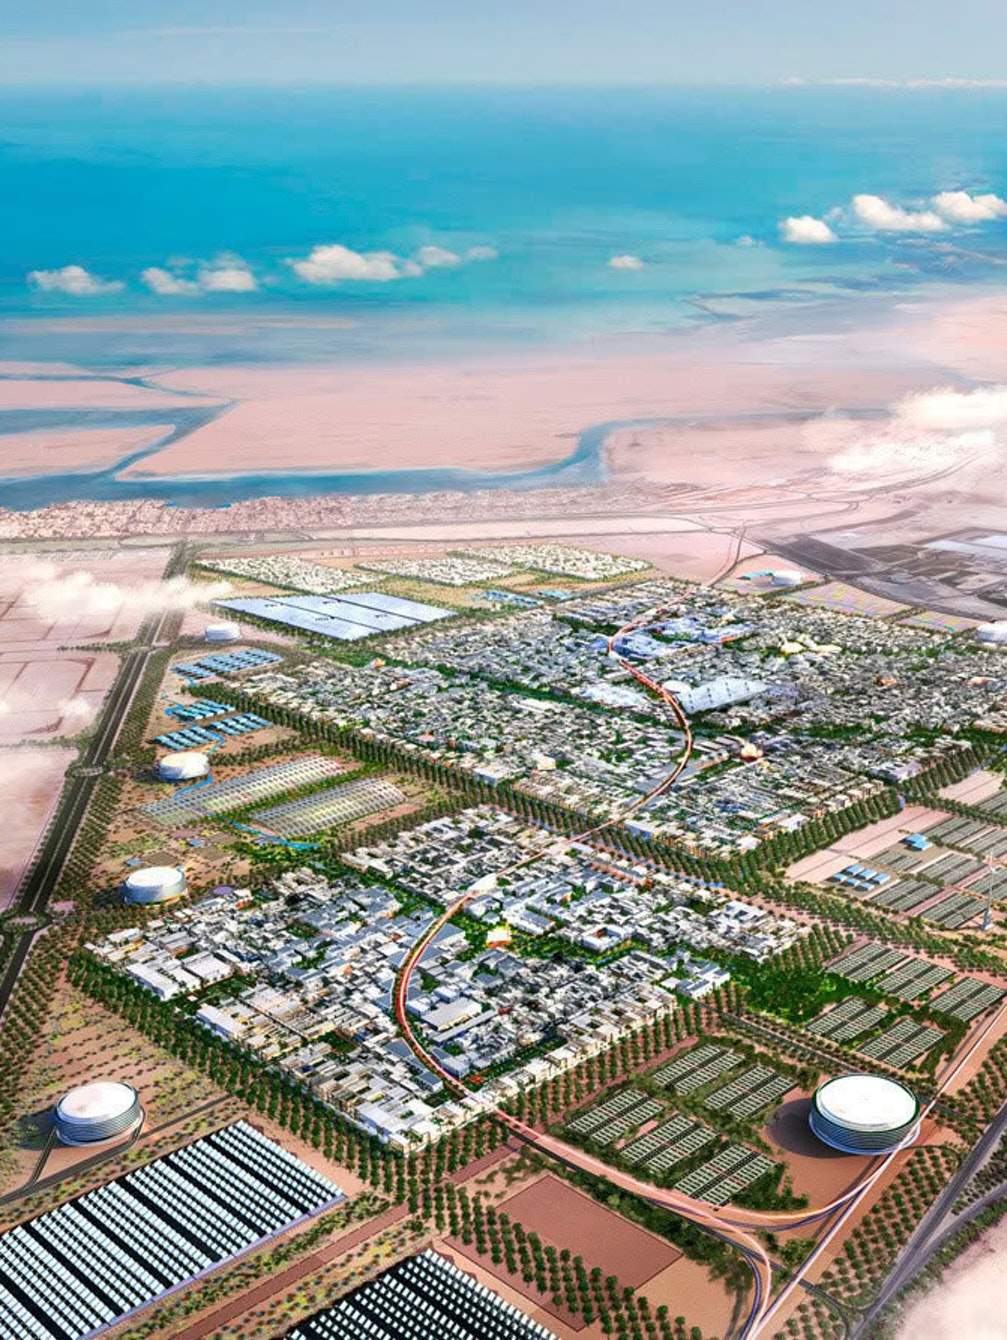 The audacious plan for Masdar City call for clouds over a desert.